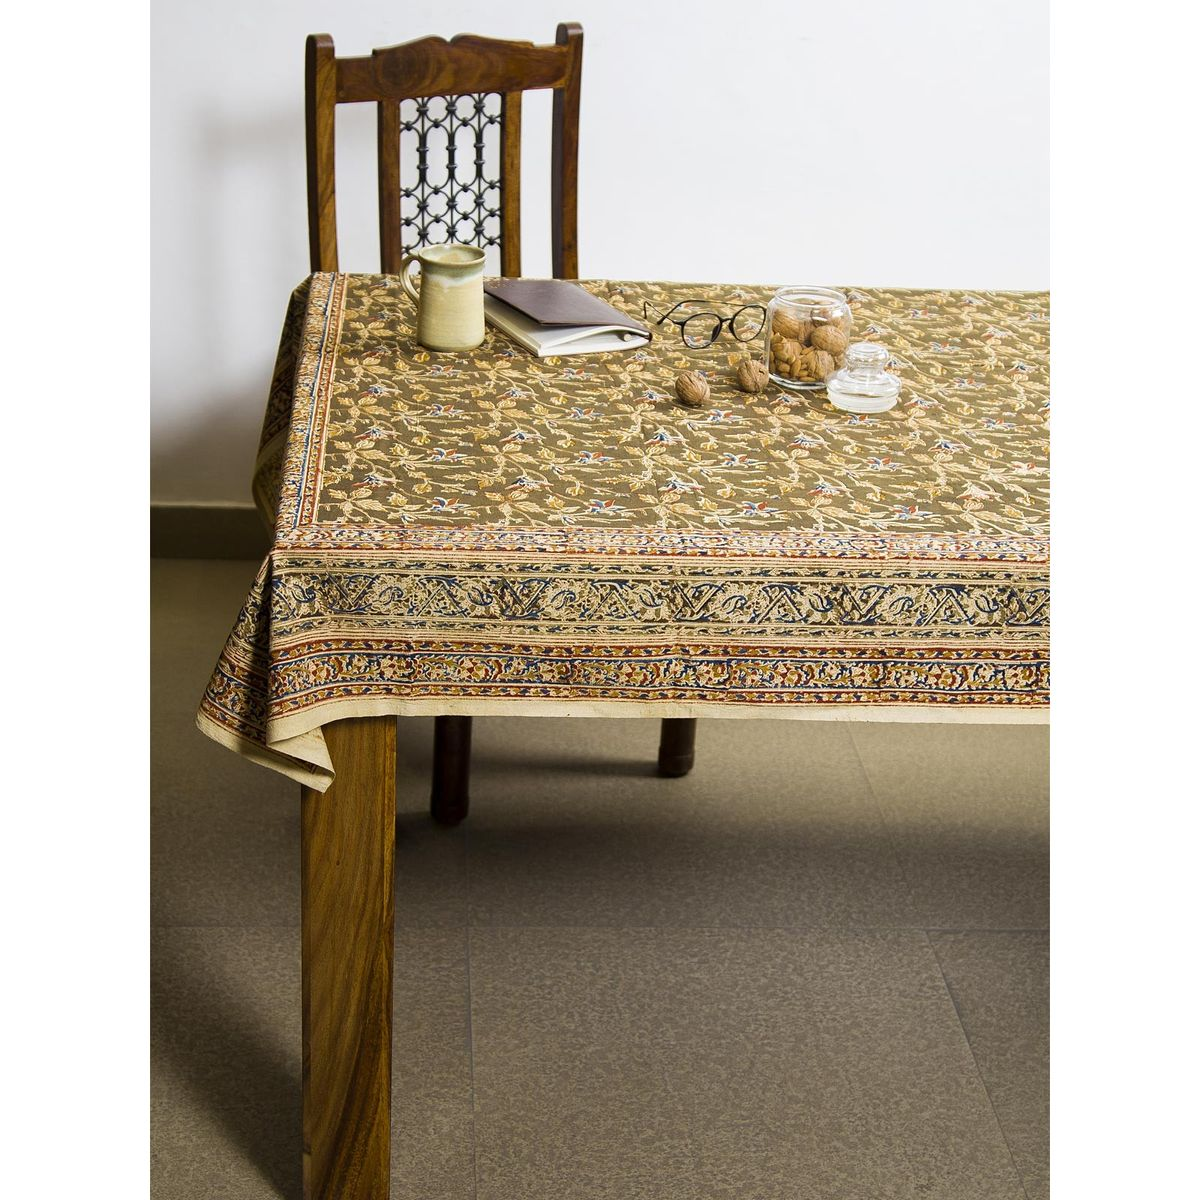 Spice Shriptah Kalamkari 6 seater table cover